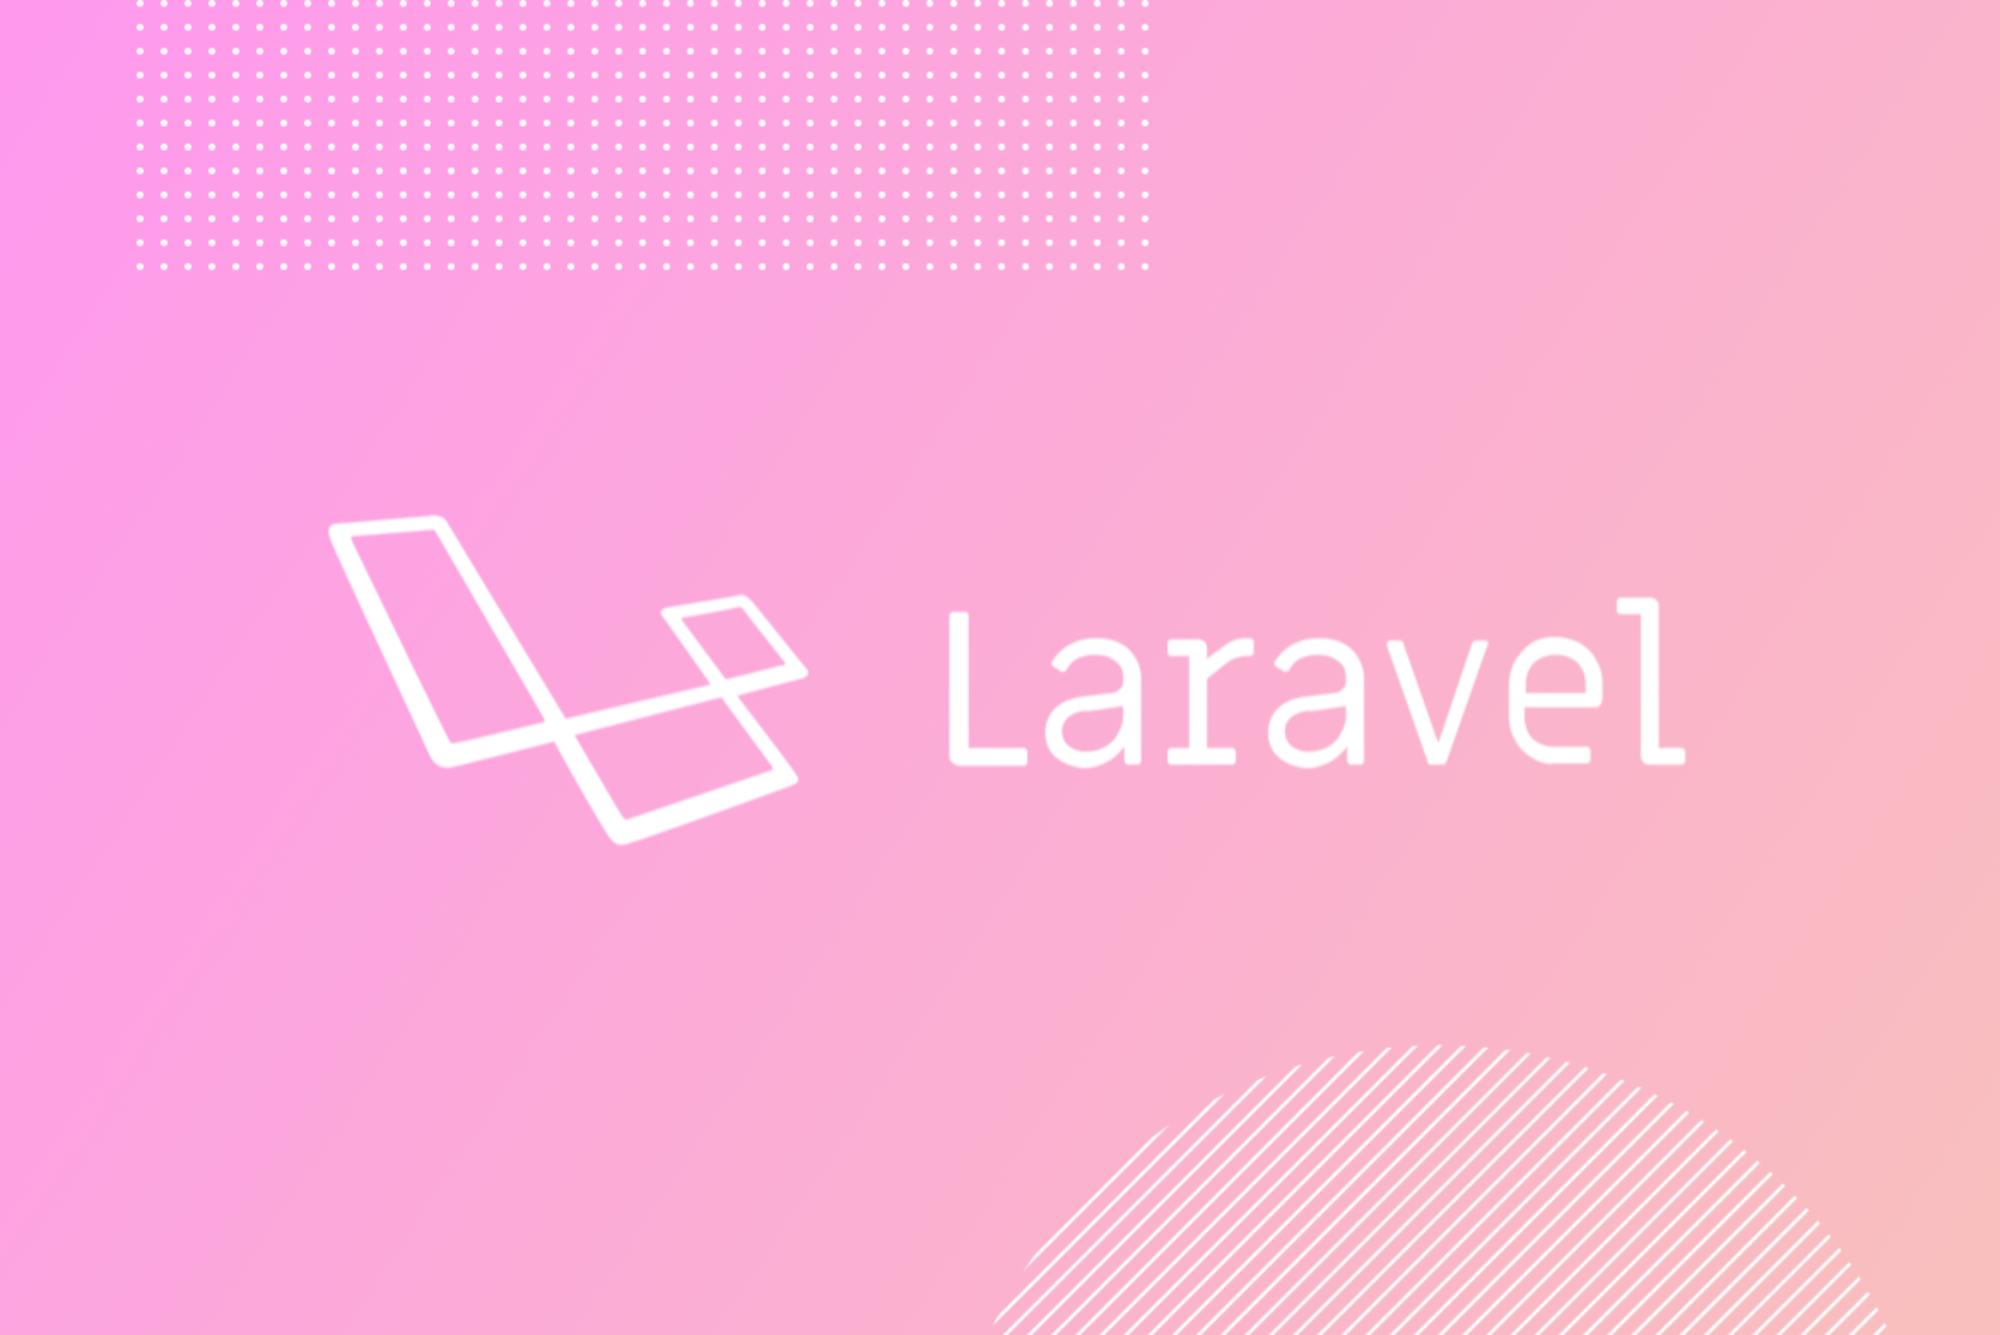 Laravel support and maintenance